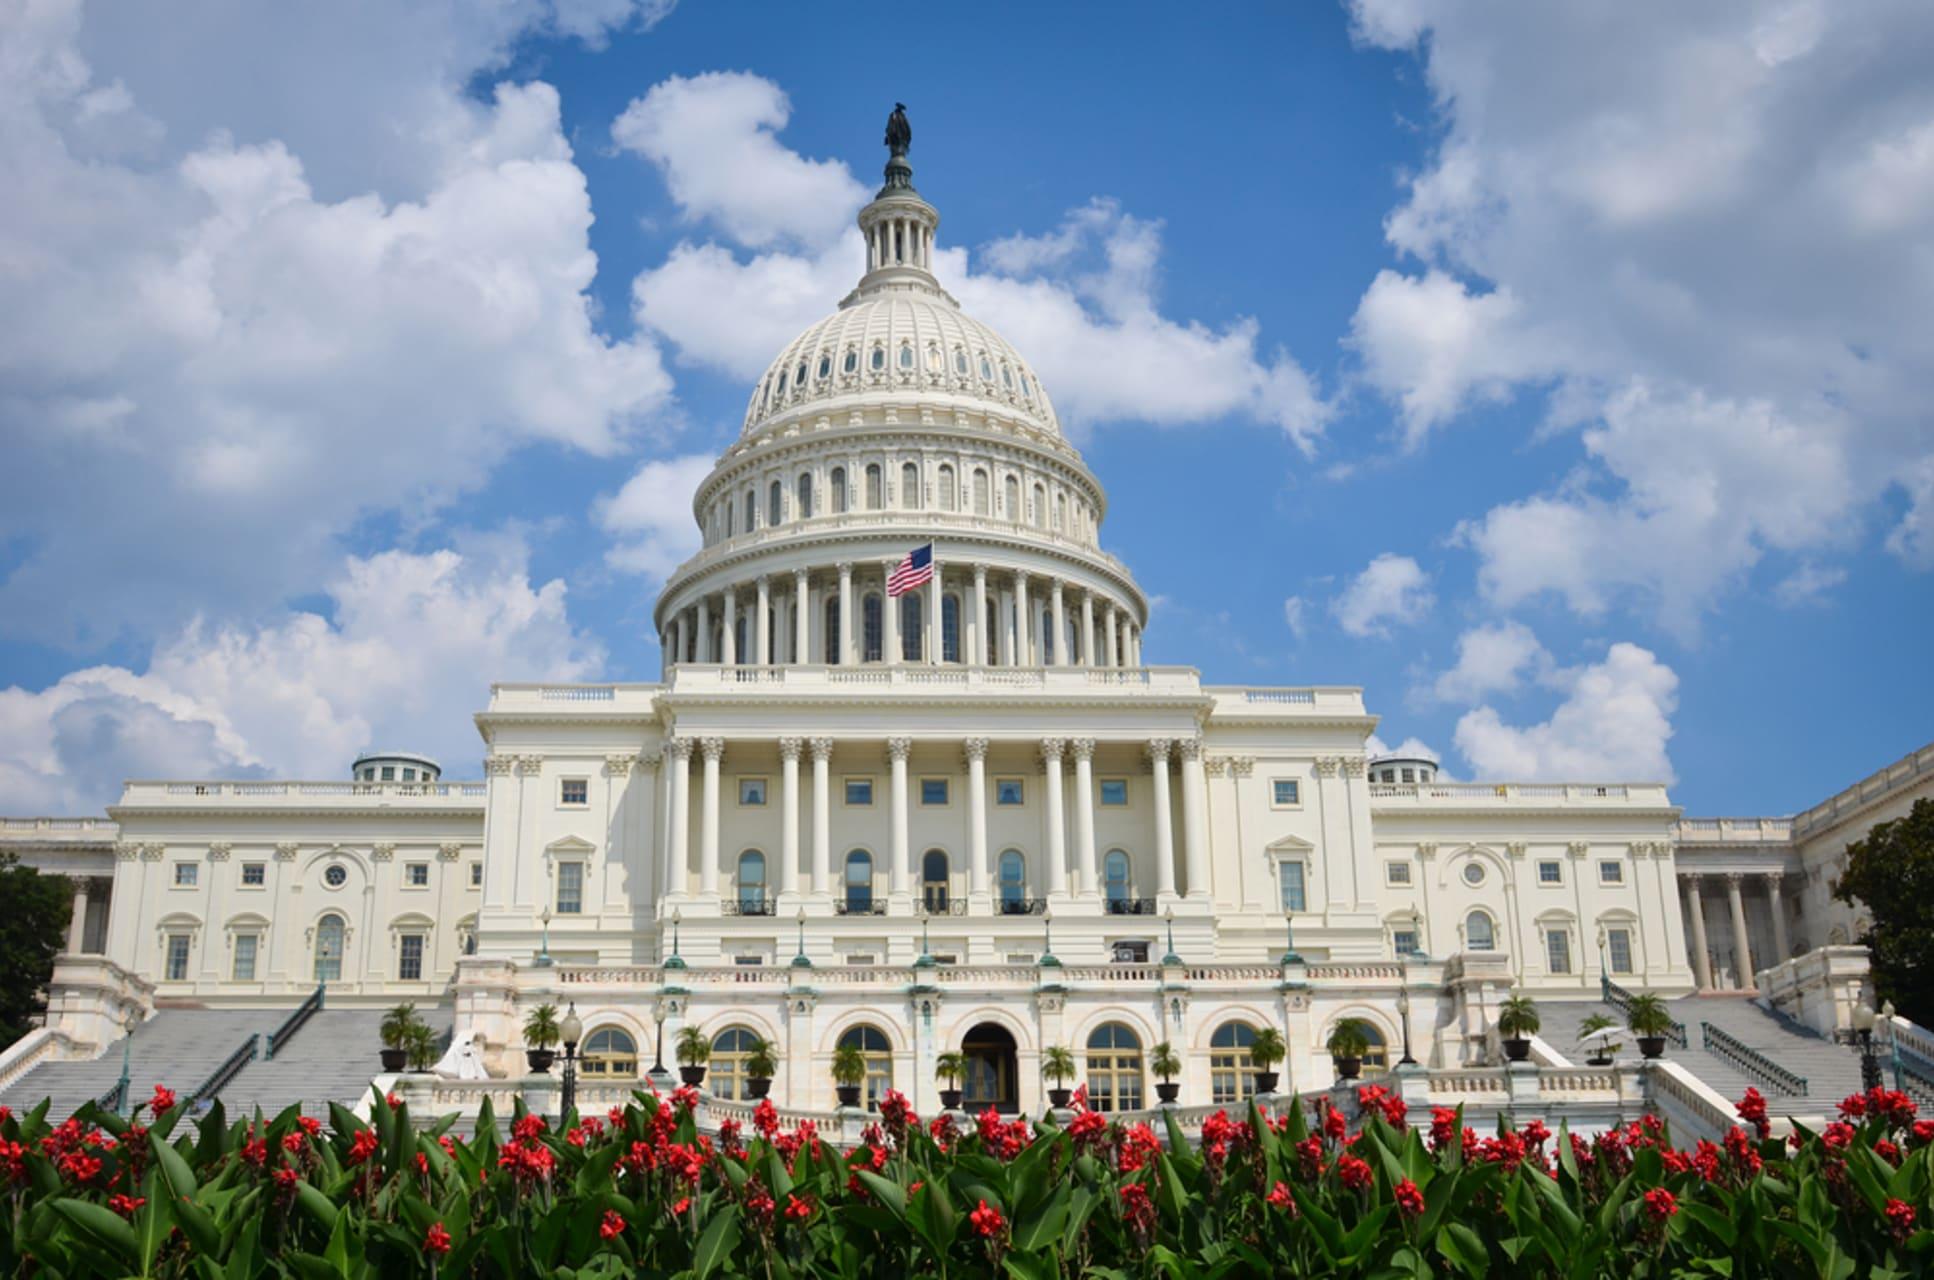 Washington D.C. cover image